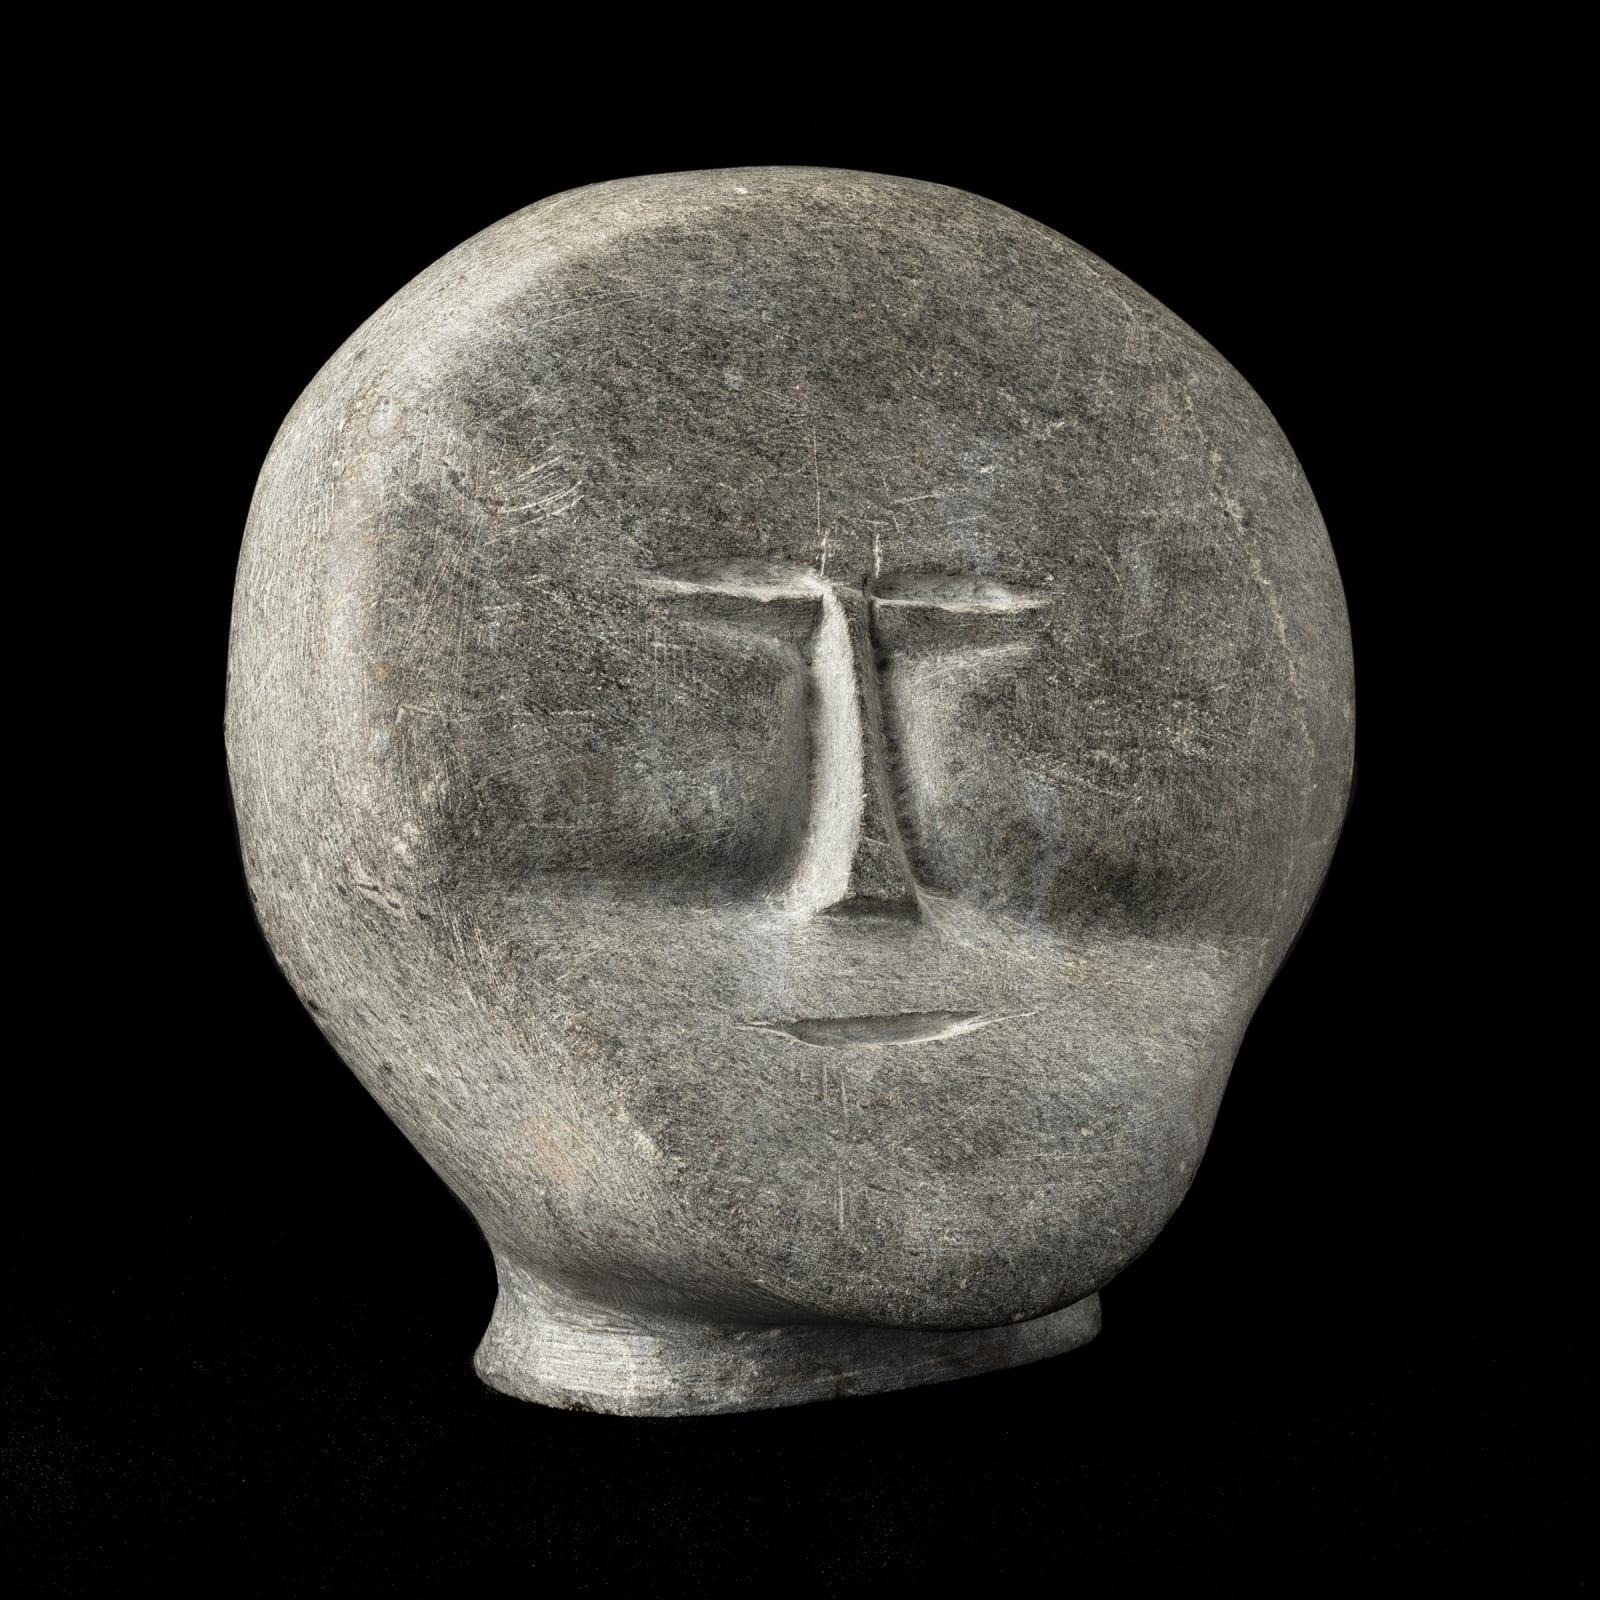 JOHN TIKTAK, R.C.A. (1916-1981) KANGIQLINIQ (RANKIN INLET) Head, c. 1965-6 ESTIMATE: $10,000 — $15,000 PRICE REALIZED: $28,800